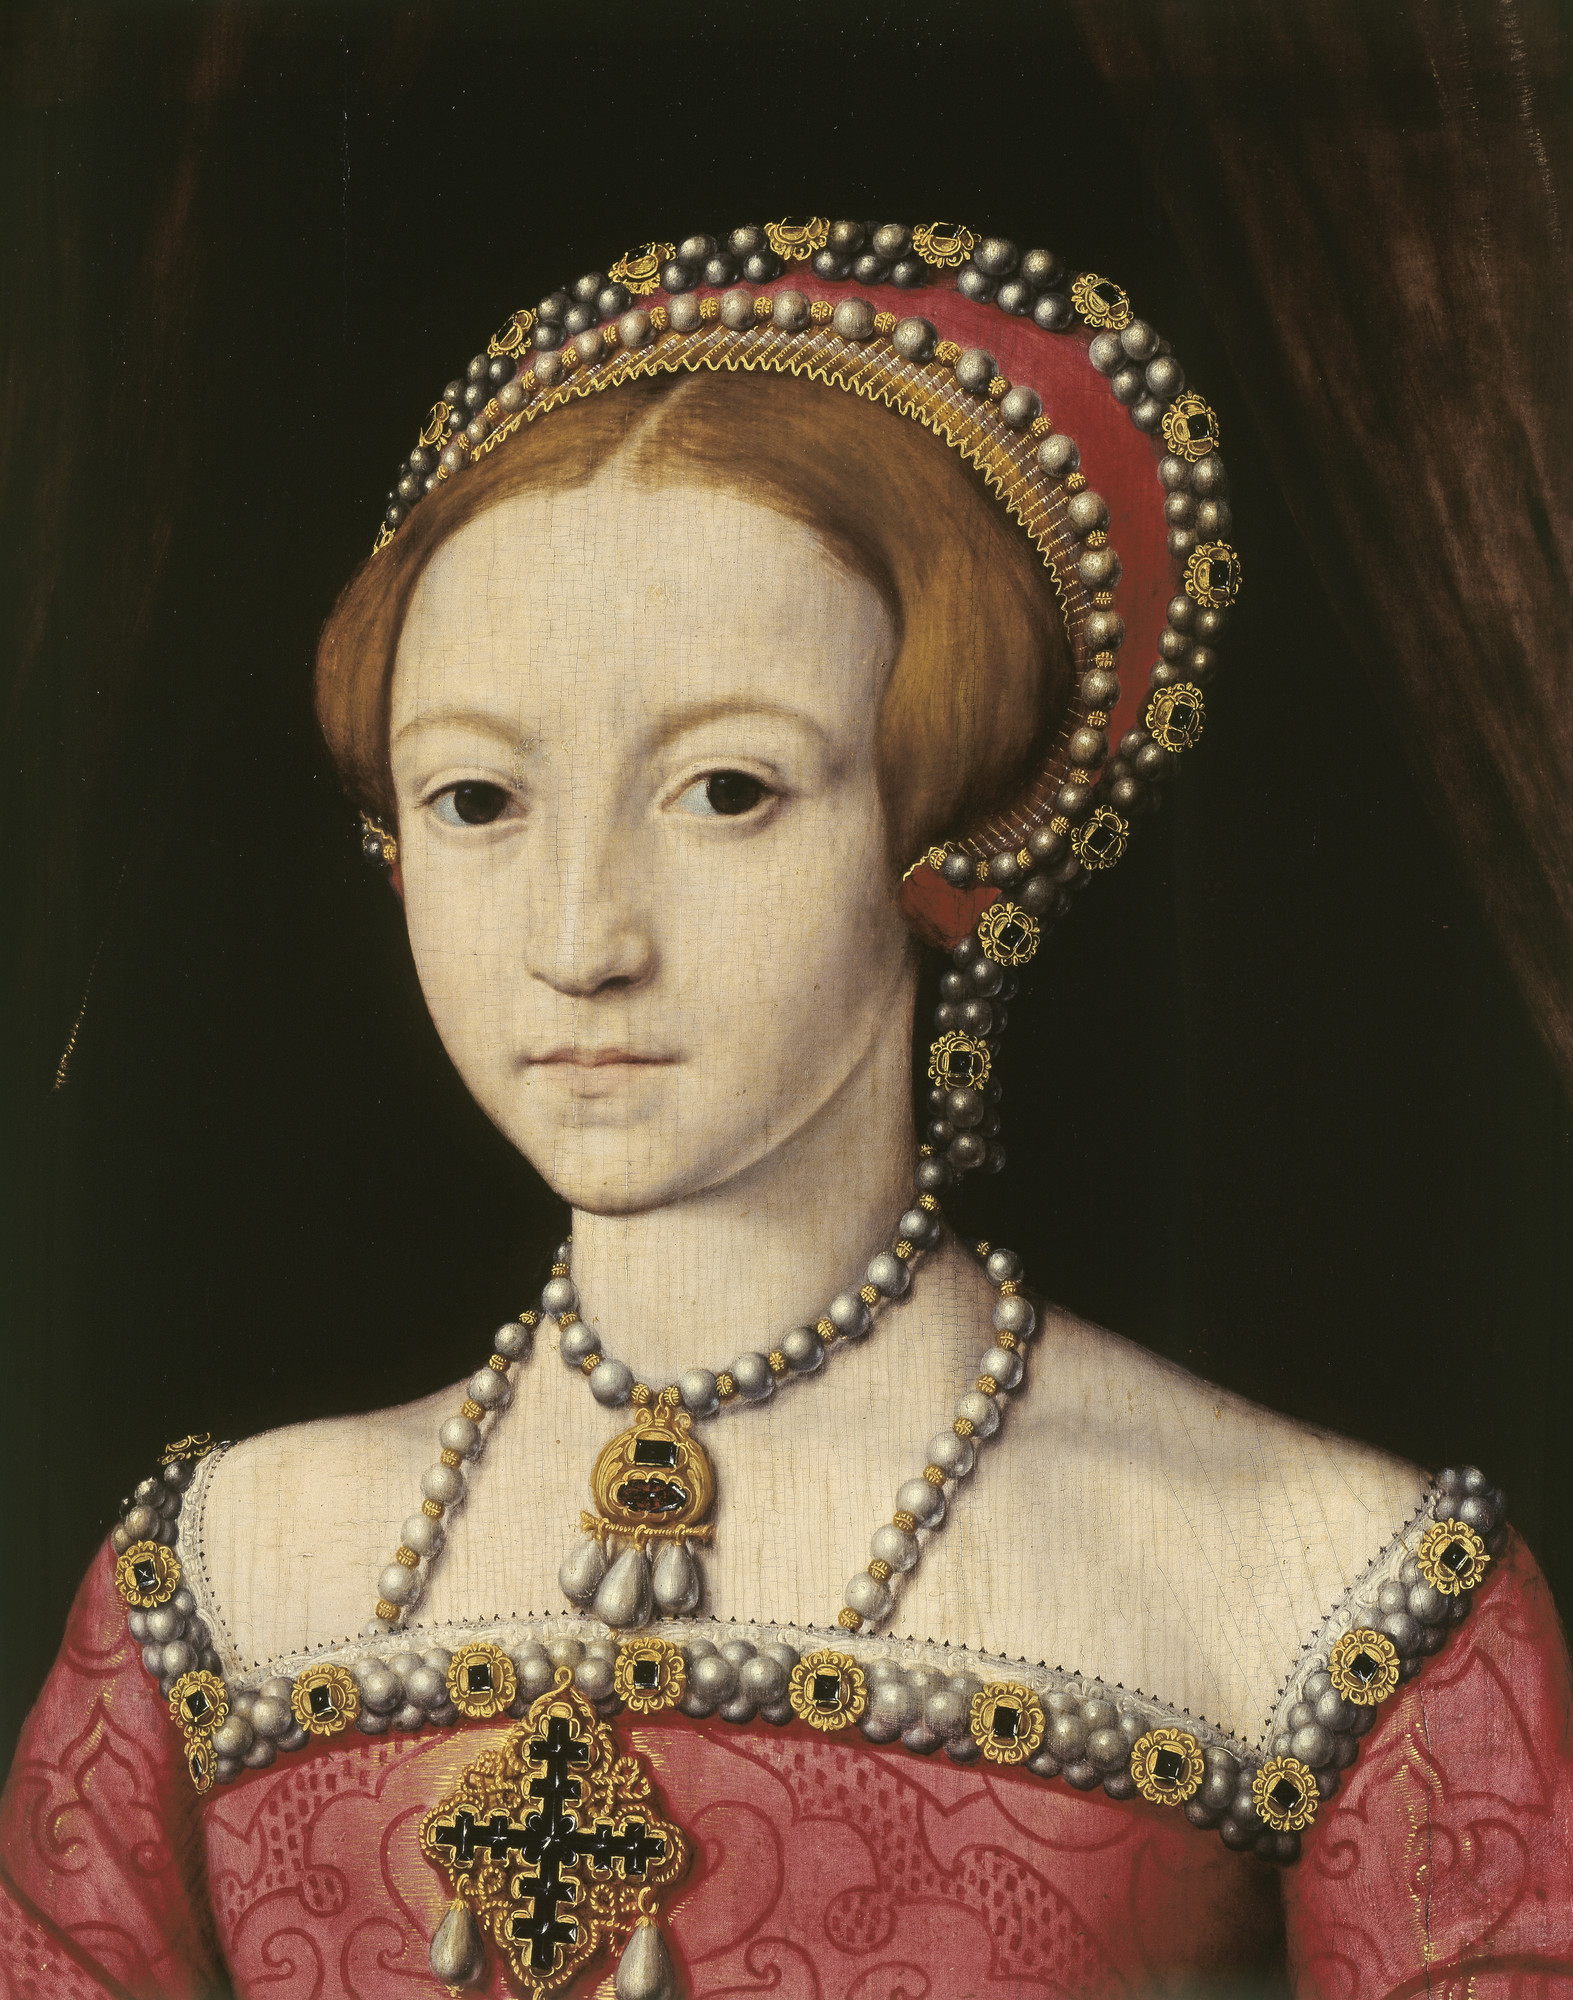 William Scrots (active 1537-53) - Elizabeth I when a Princess